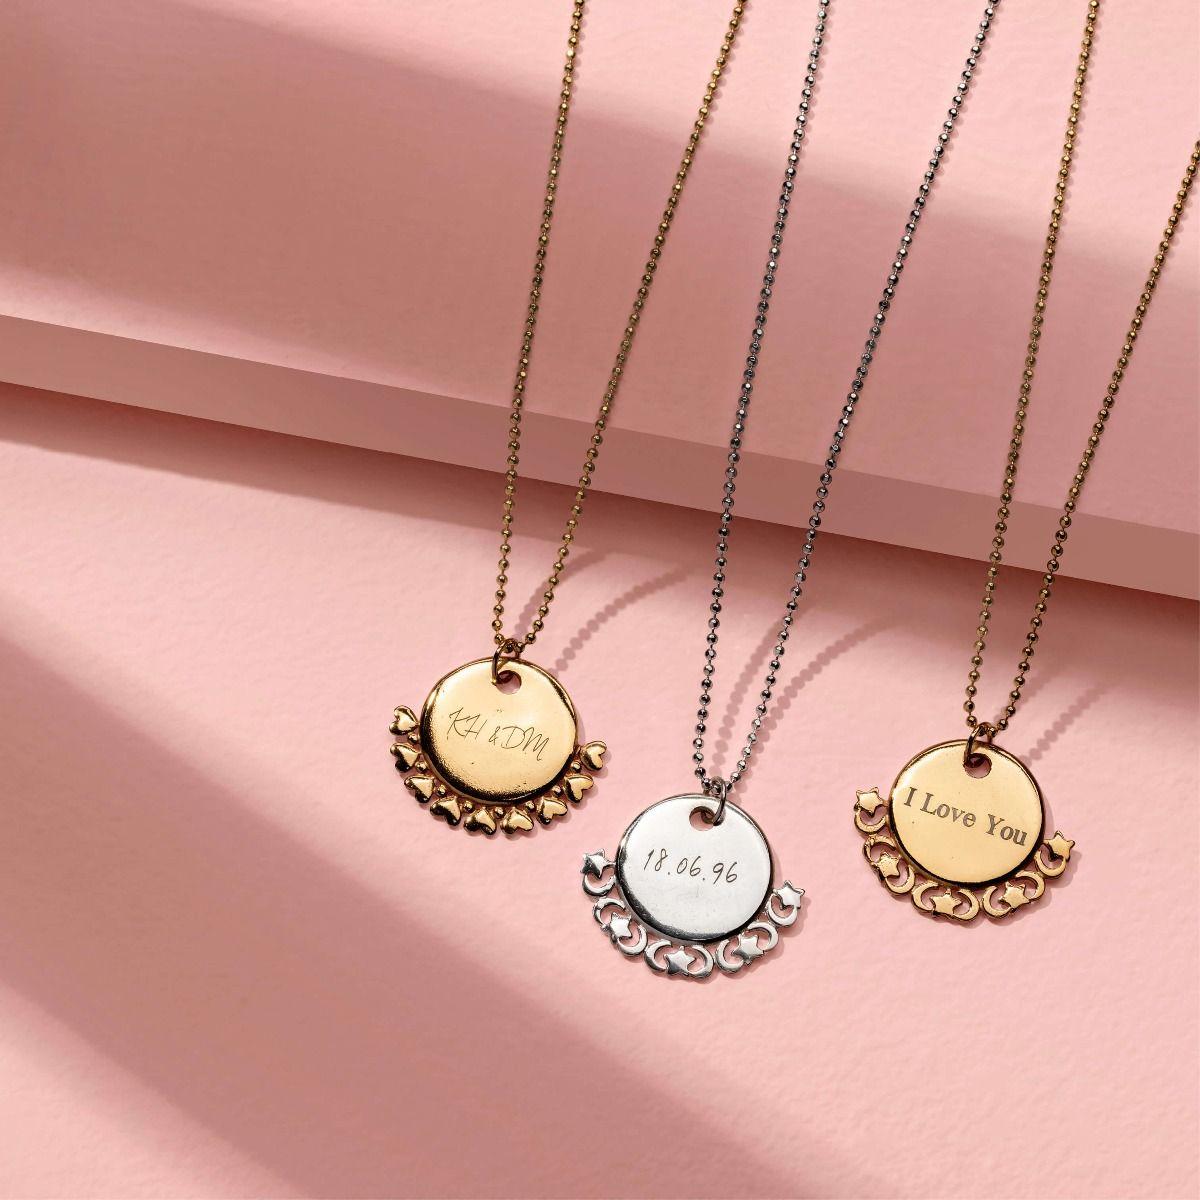 ChloBo Personalised Diamond Cut Adjuster Necklace with Star Charm - Gold (PGCDCADJ3064)